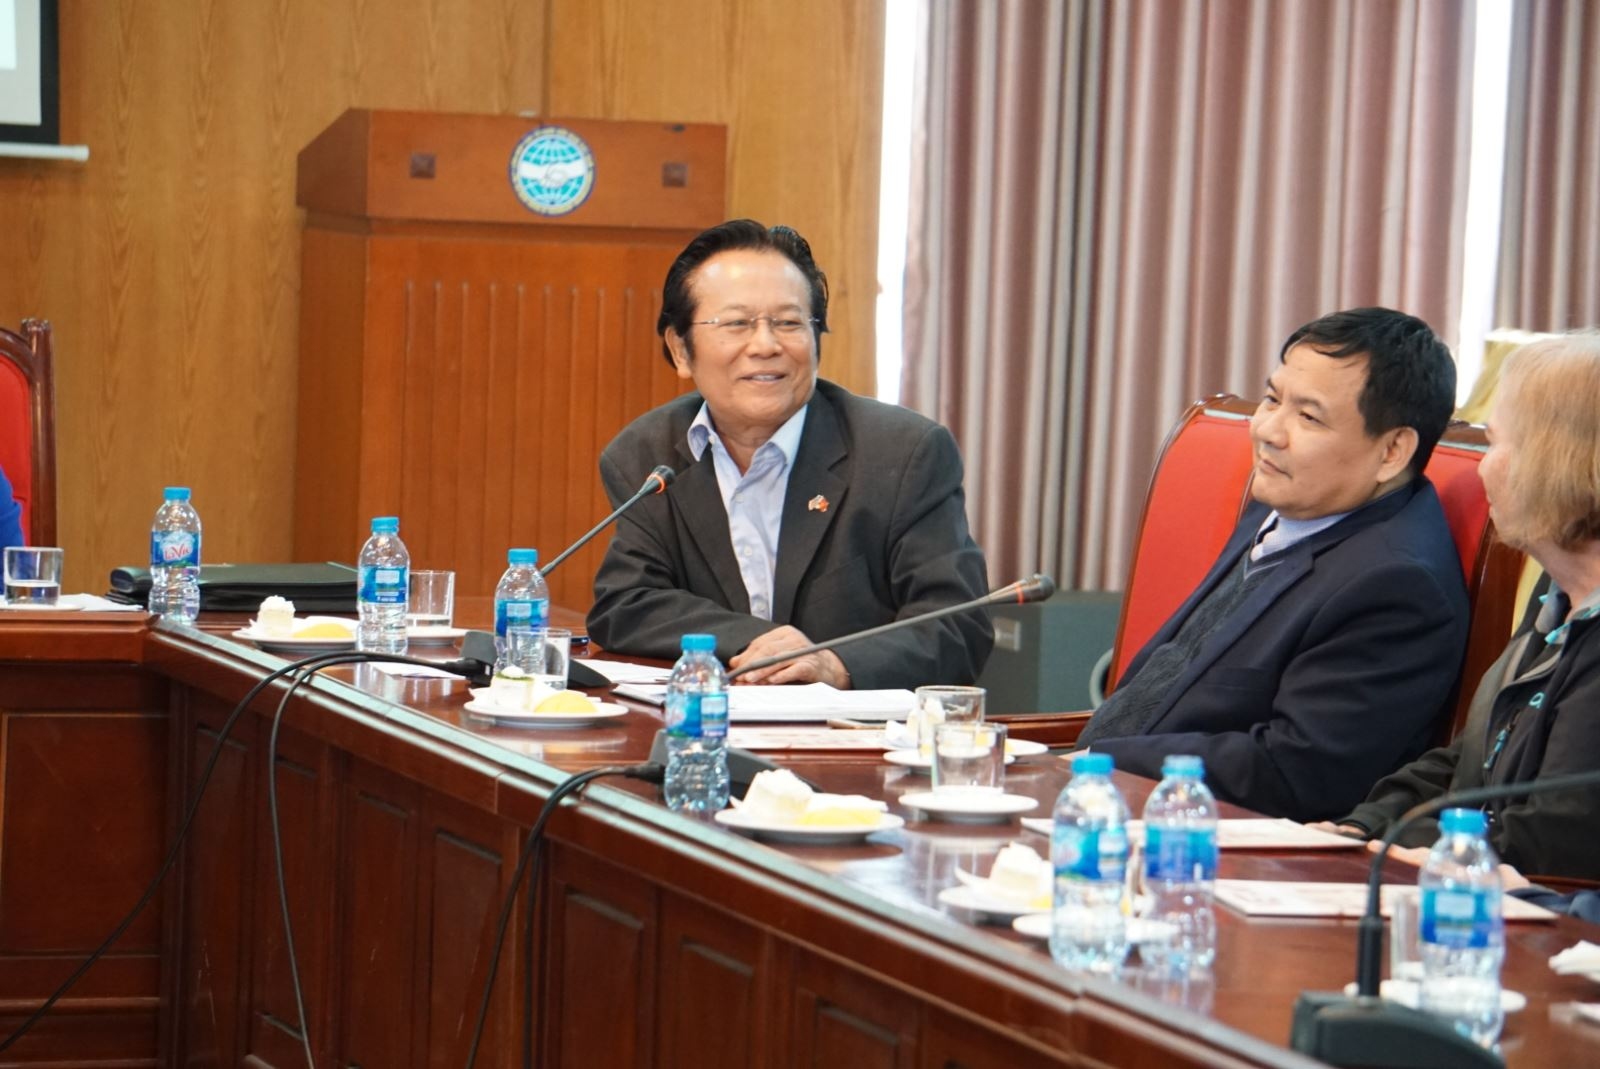 Vietnam appreciates Peace Trees Vietnam's contributions to heal war wounds